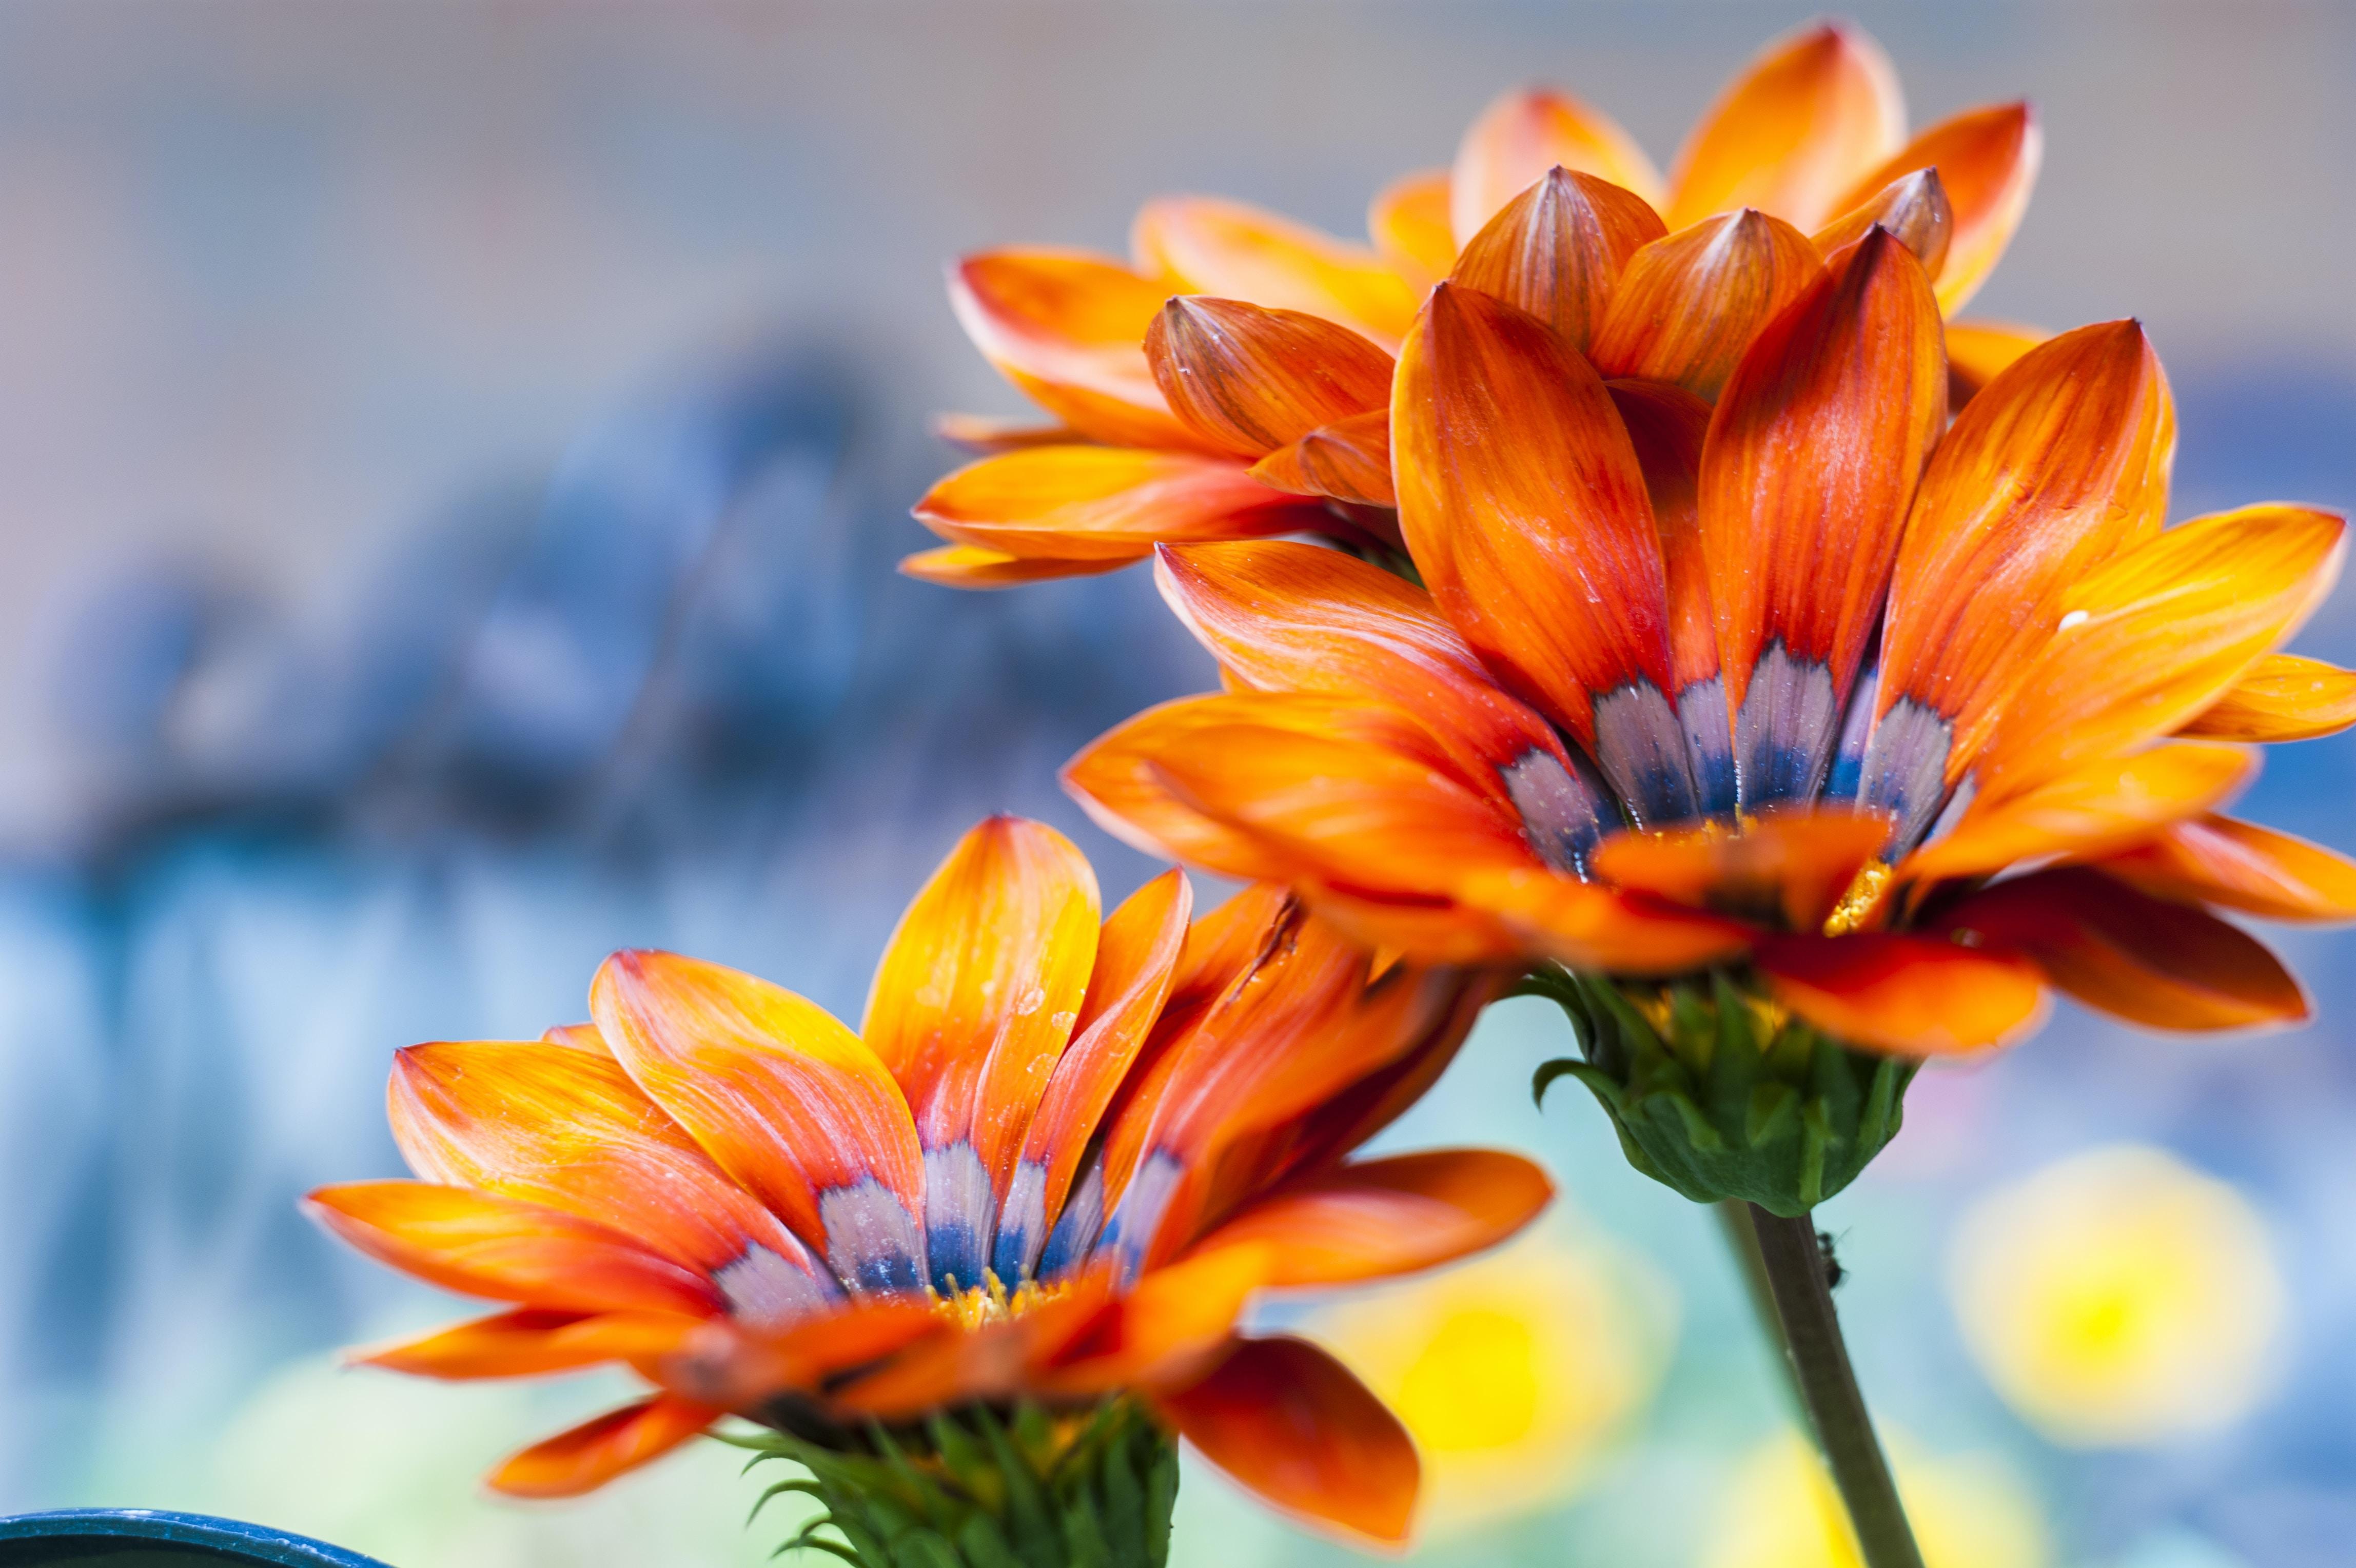 selective focus photography of orange petaled flowers